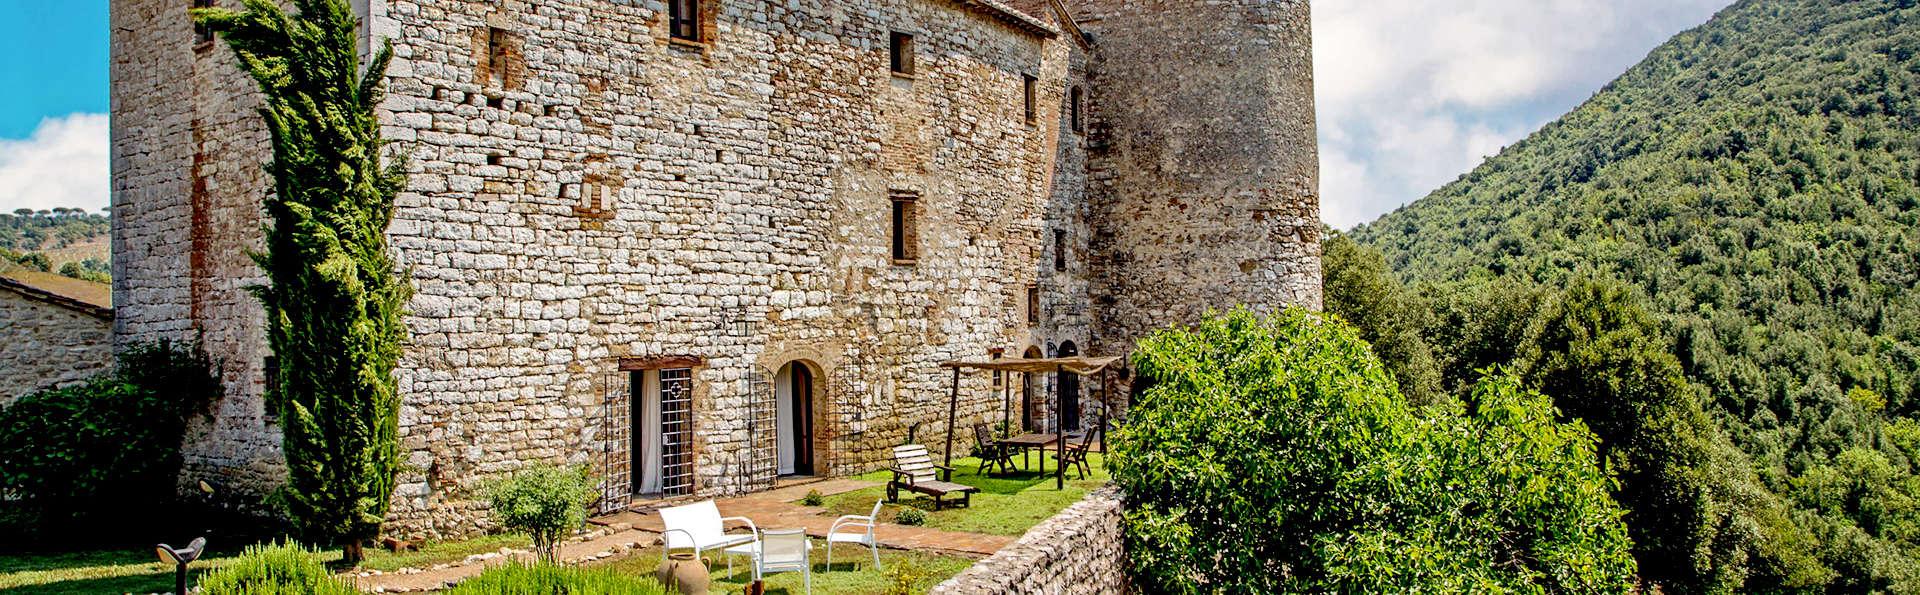 Castello Valenzino - Edit_Front2.jpg